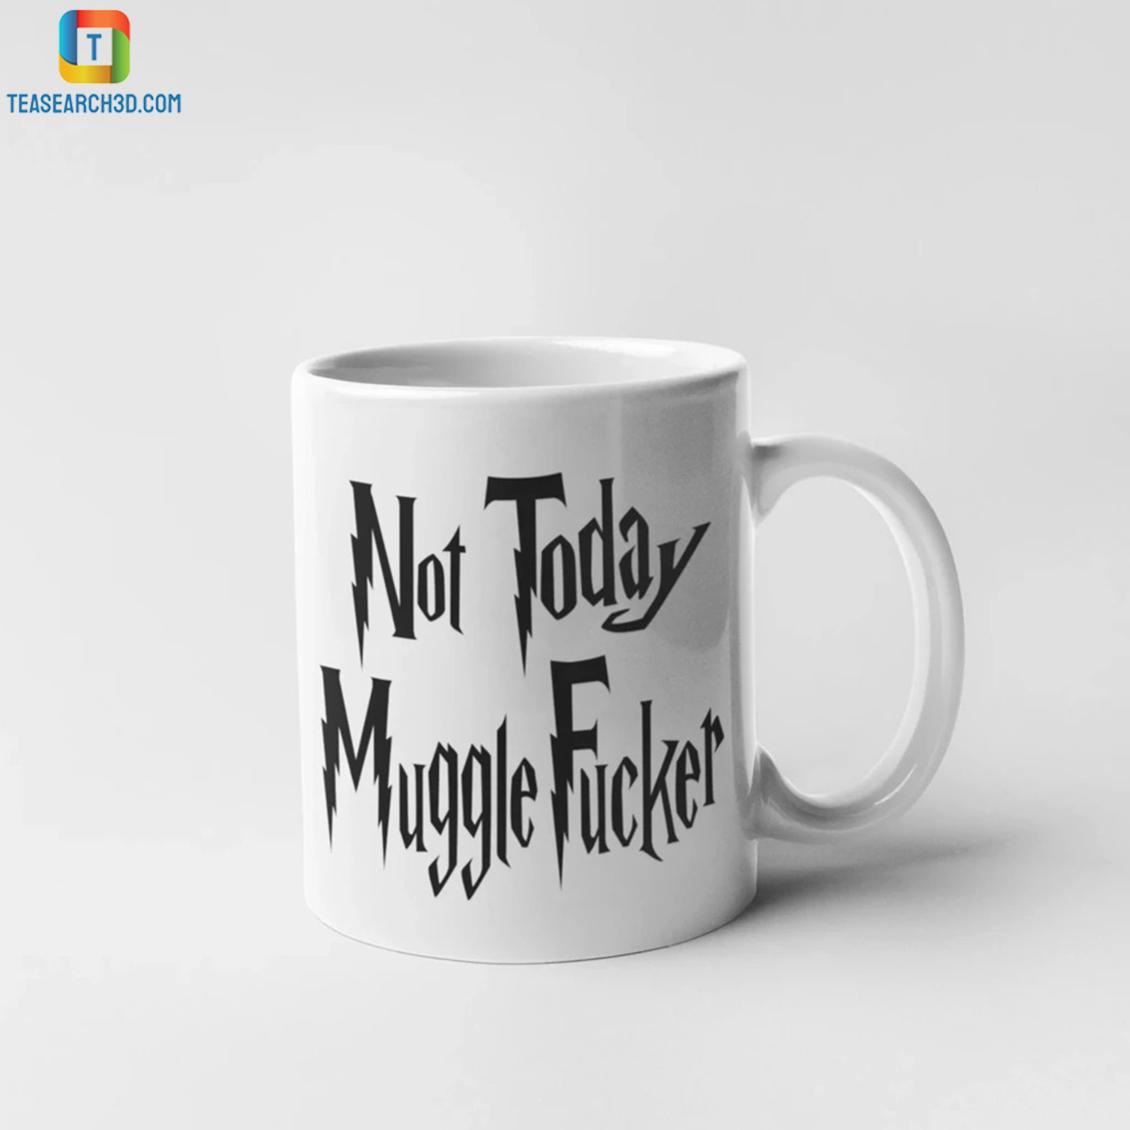 Not today mugglefucker mug 1